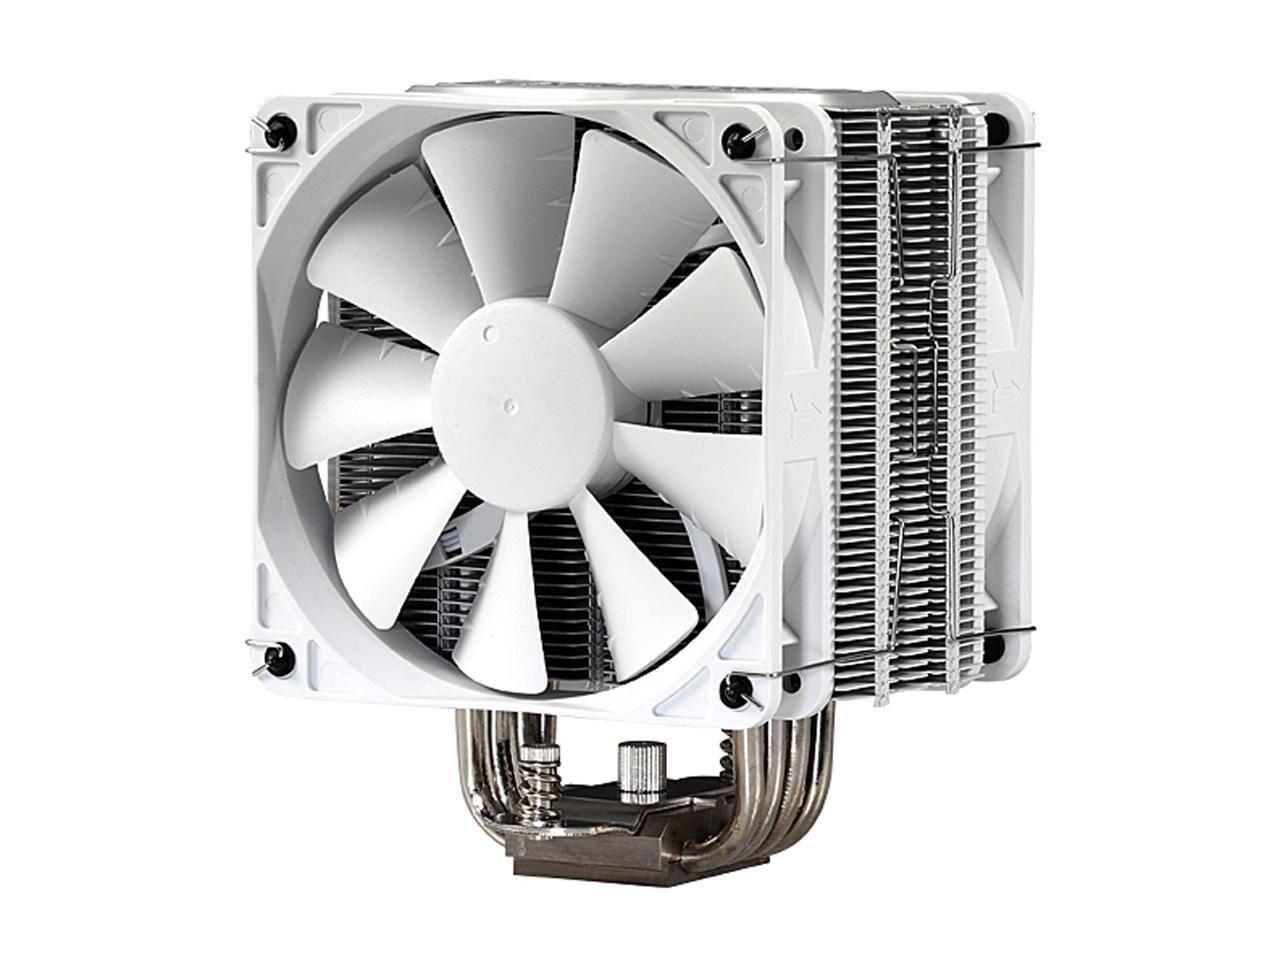 Phanteks PH-TC12DX Dual 120mm PWM CPU Cooler for $23.99 (after $30 Phanteks MIR and PC)